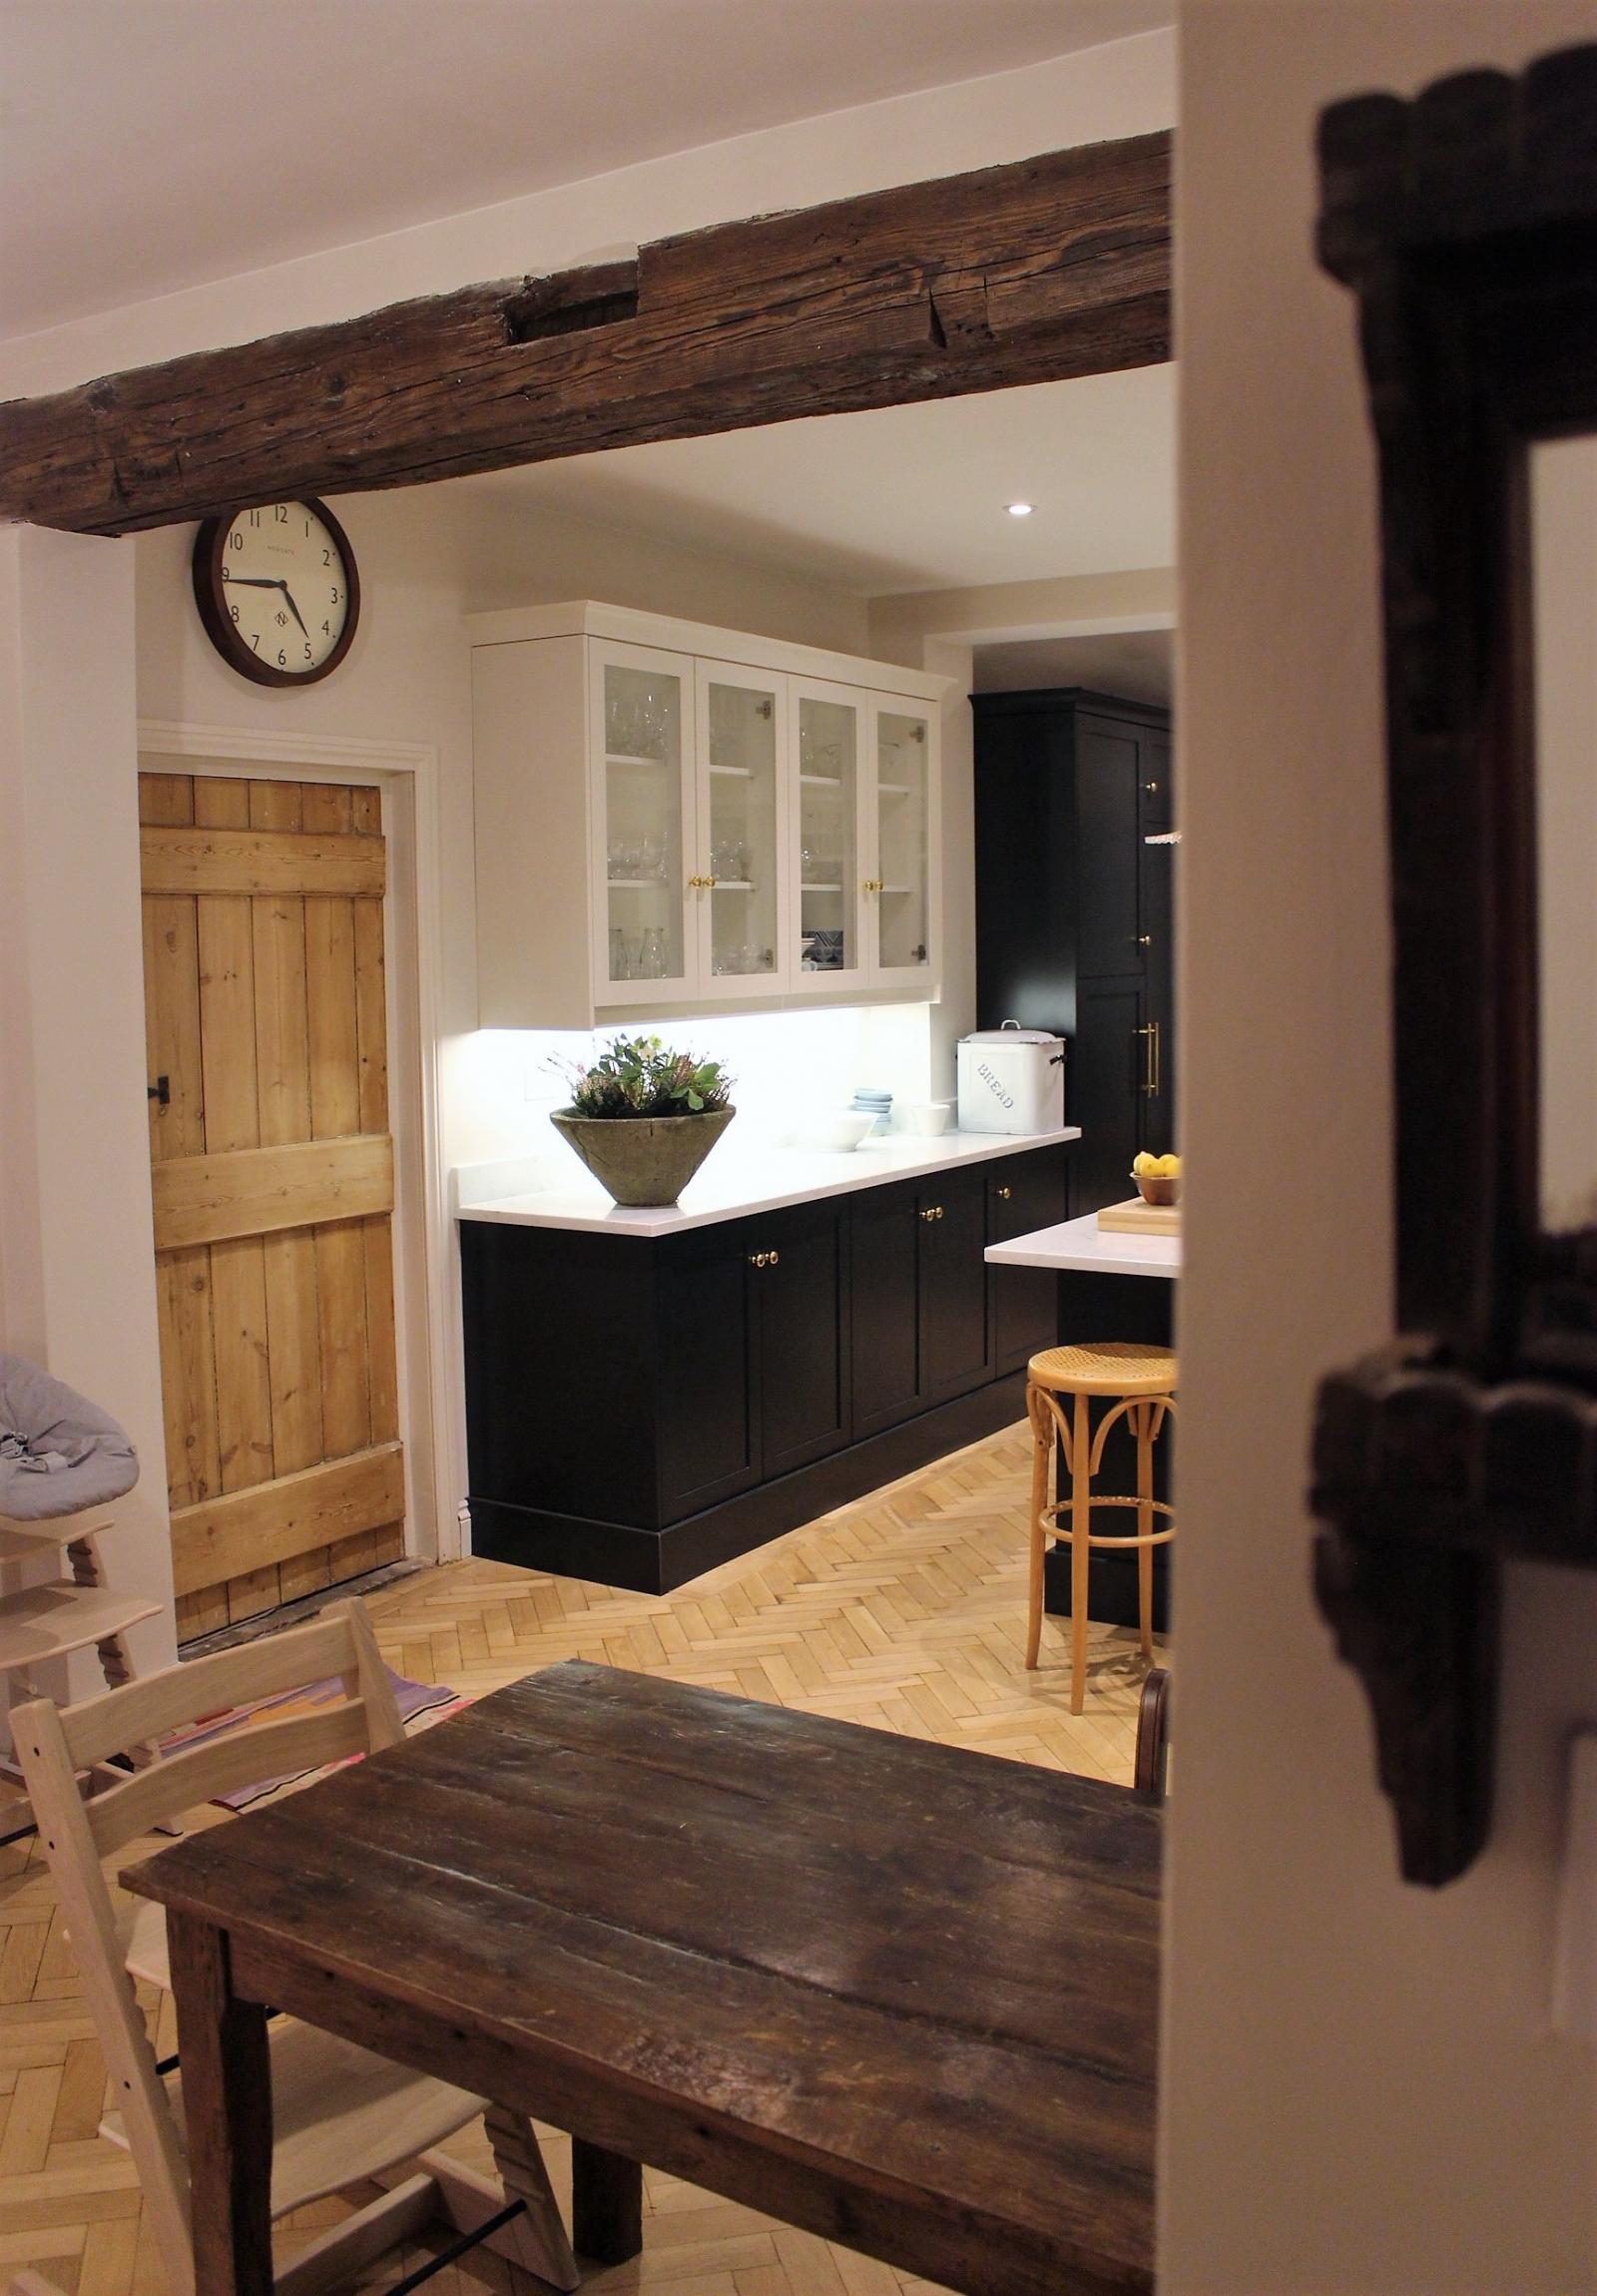 Kitchen Design Inspiration - our Studio 81 Design kitchen